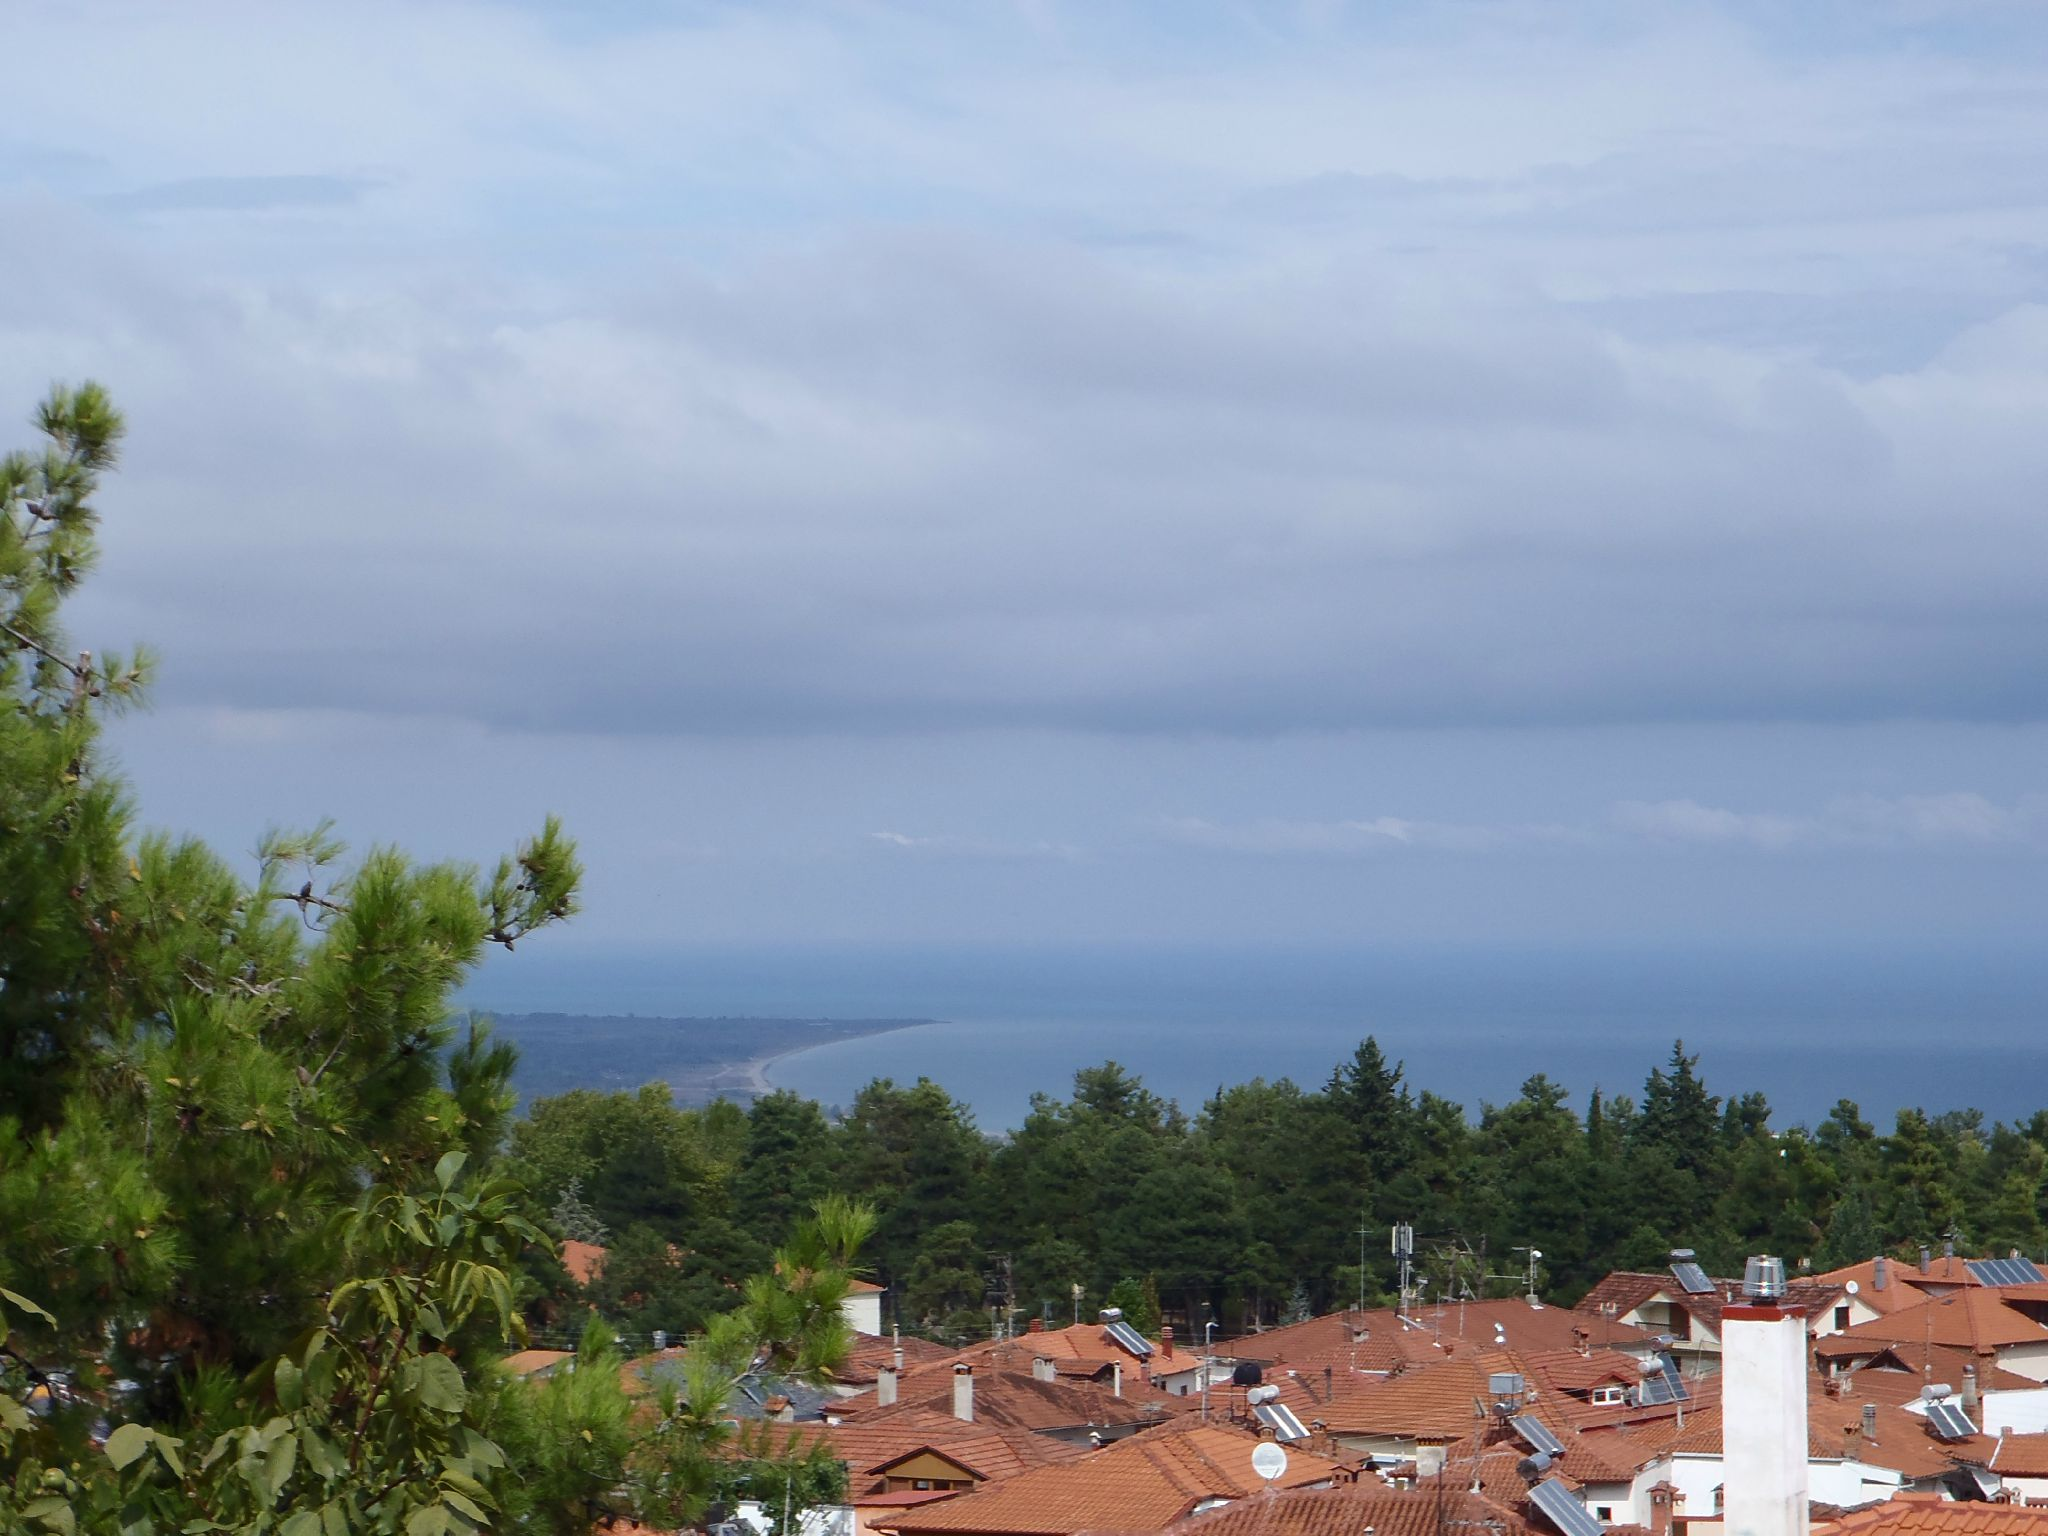 grece : lithokoro vue sur katarina et la mer egée